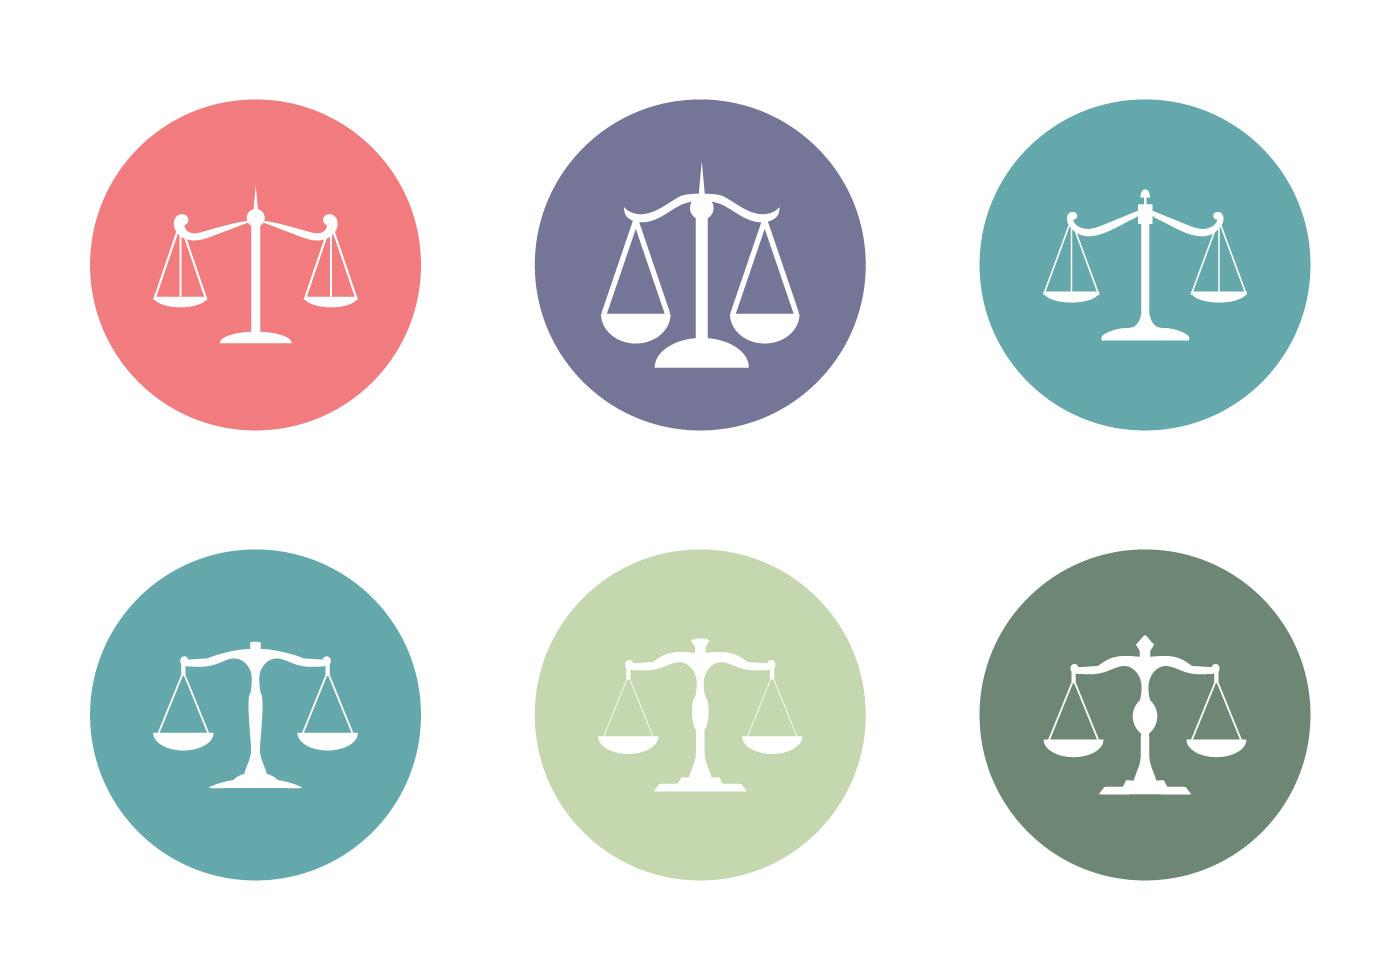 Free Law Office Vector Icon - Download Free Vectors ...